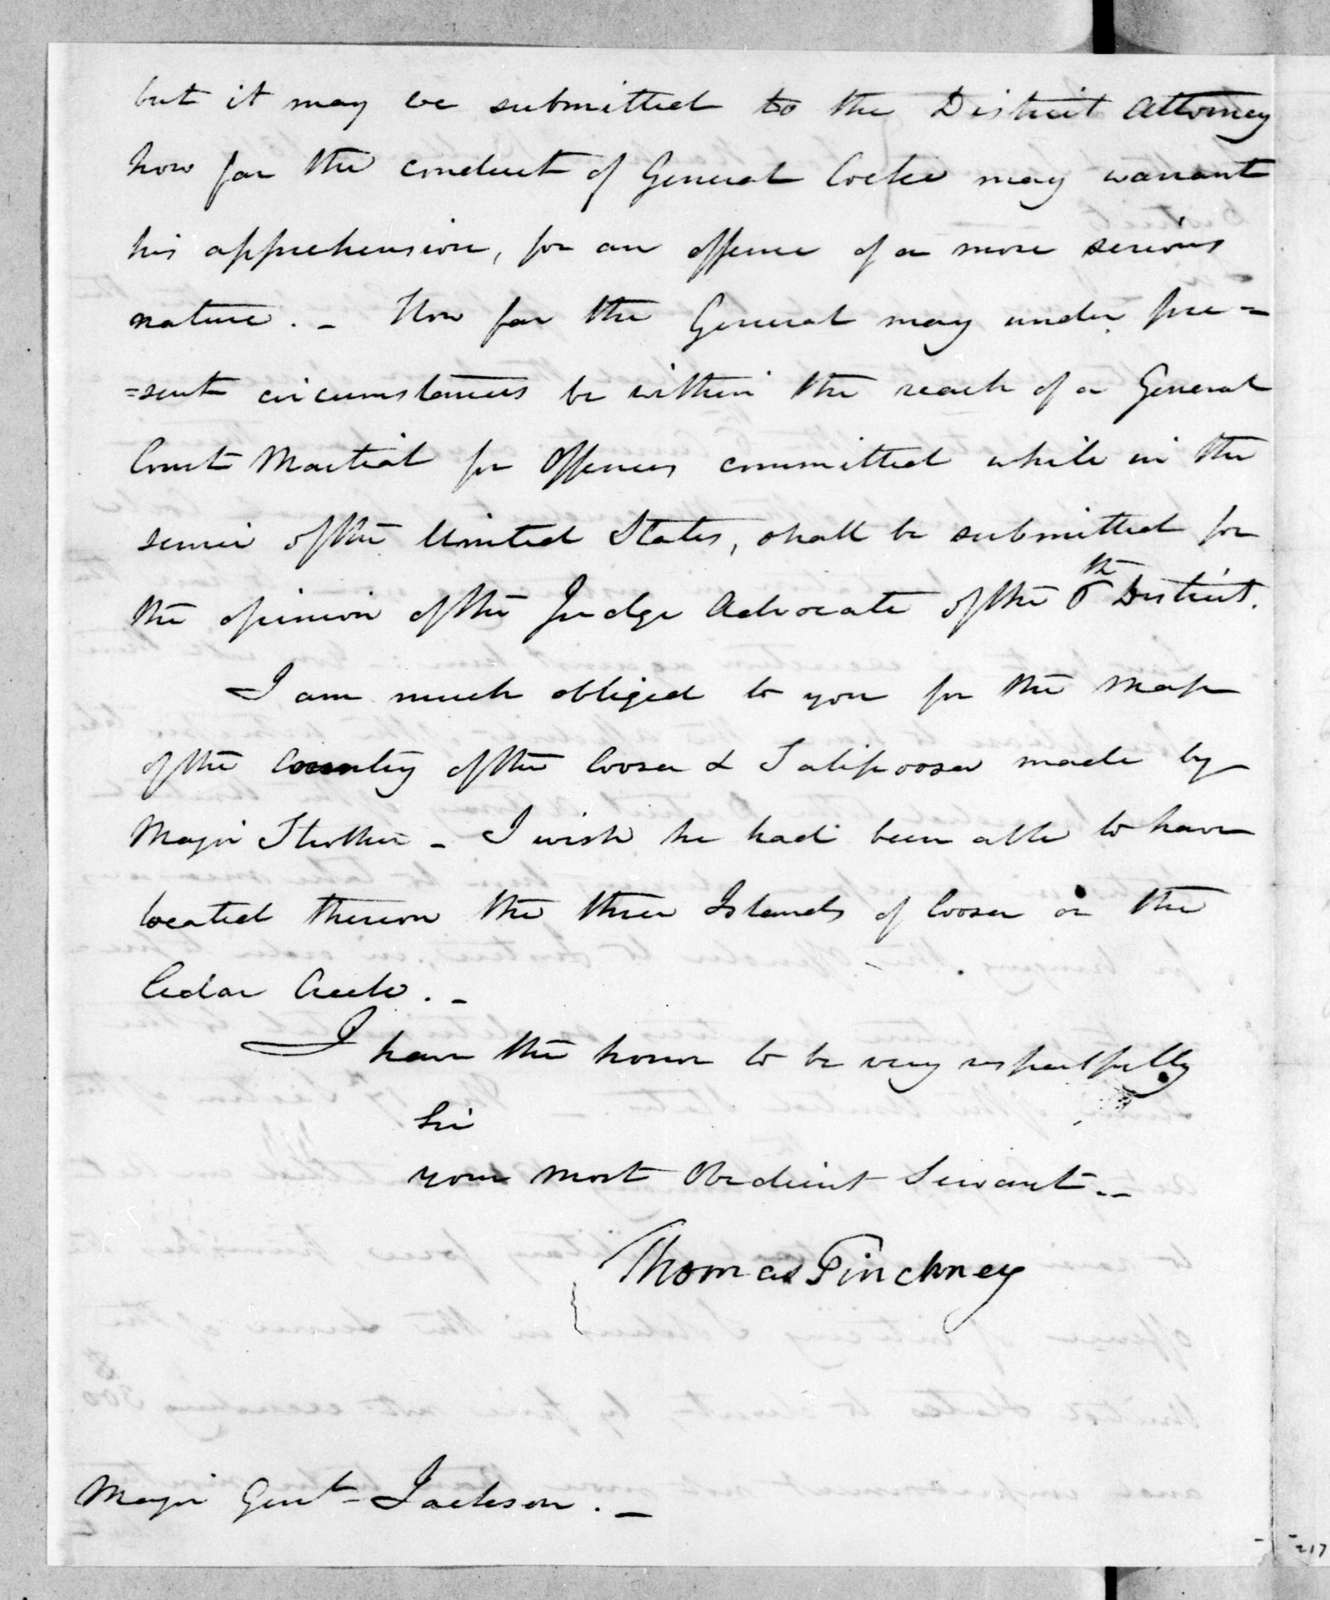 Thomas Pinckney to Andrew Jackson, March 13, 1814